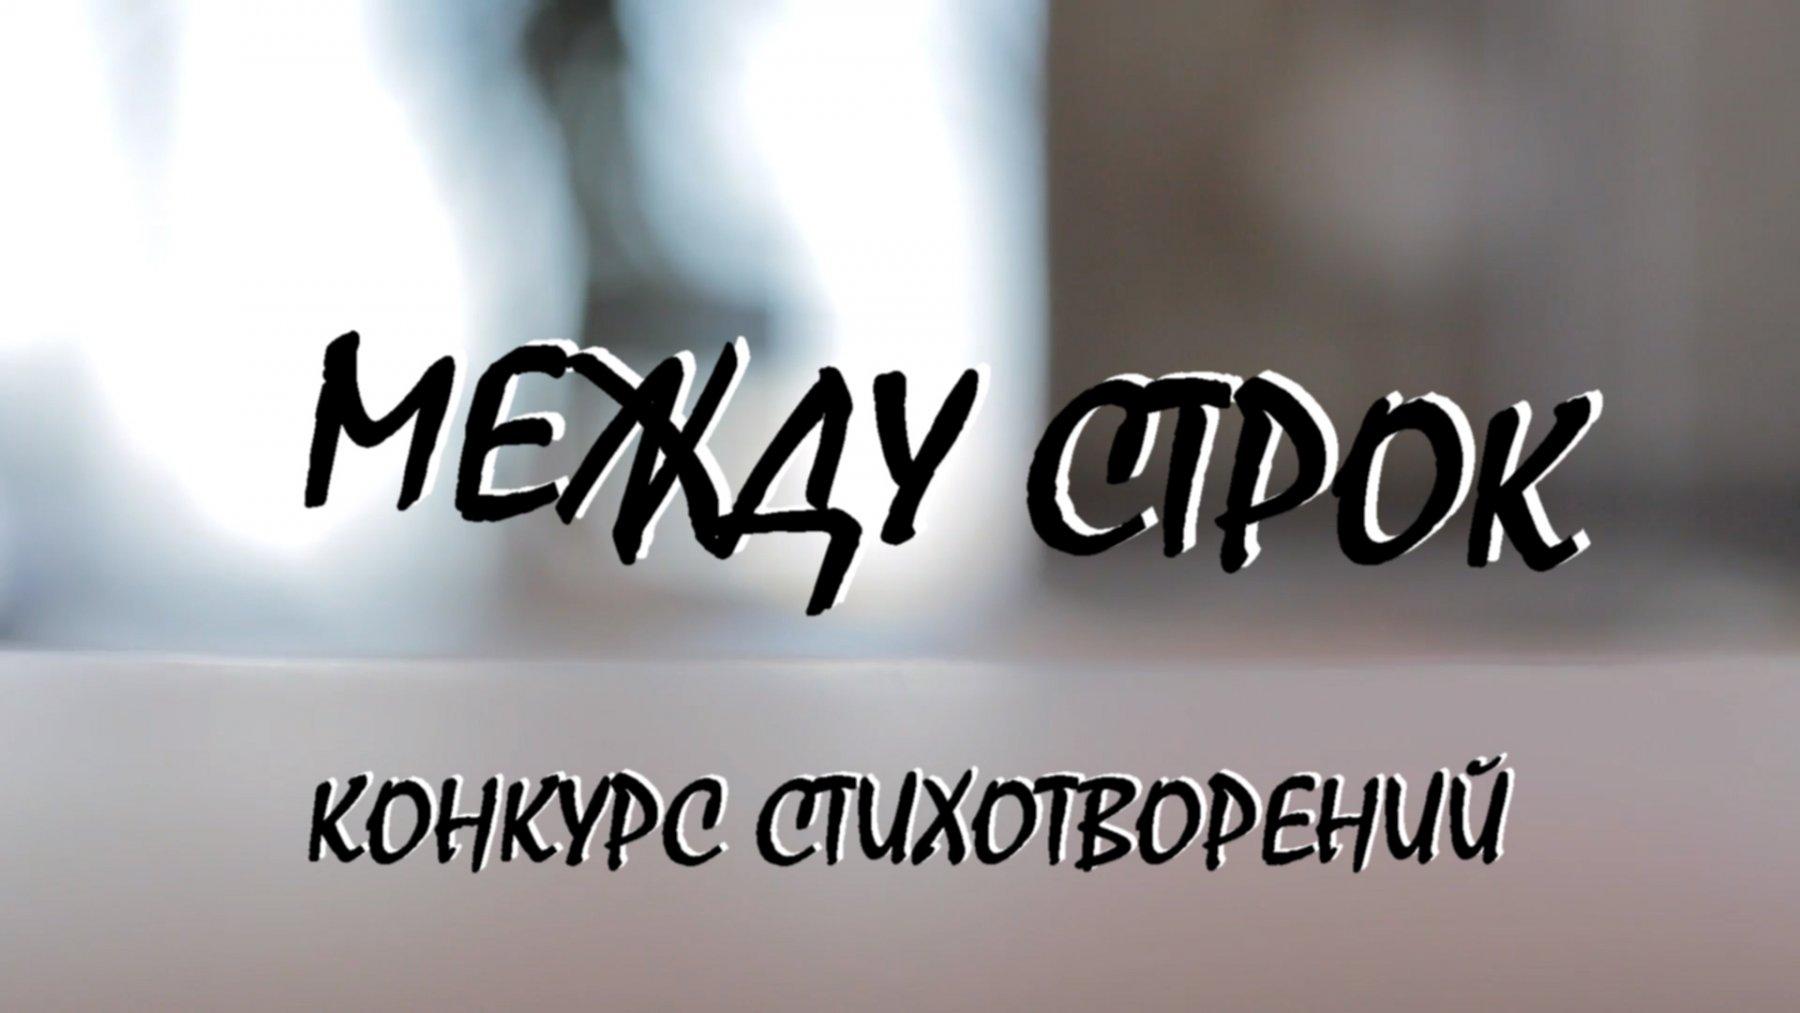 "ИТОГИ конкурса стихотворений ""Между строк"" (2021 г.)"